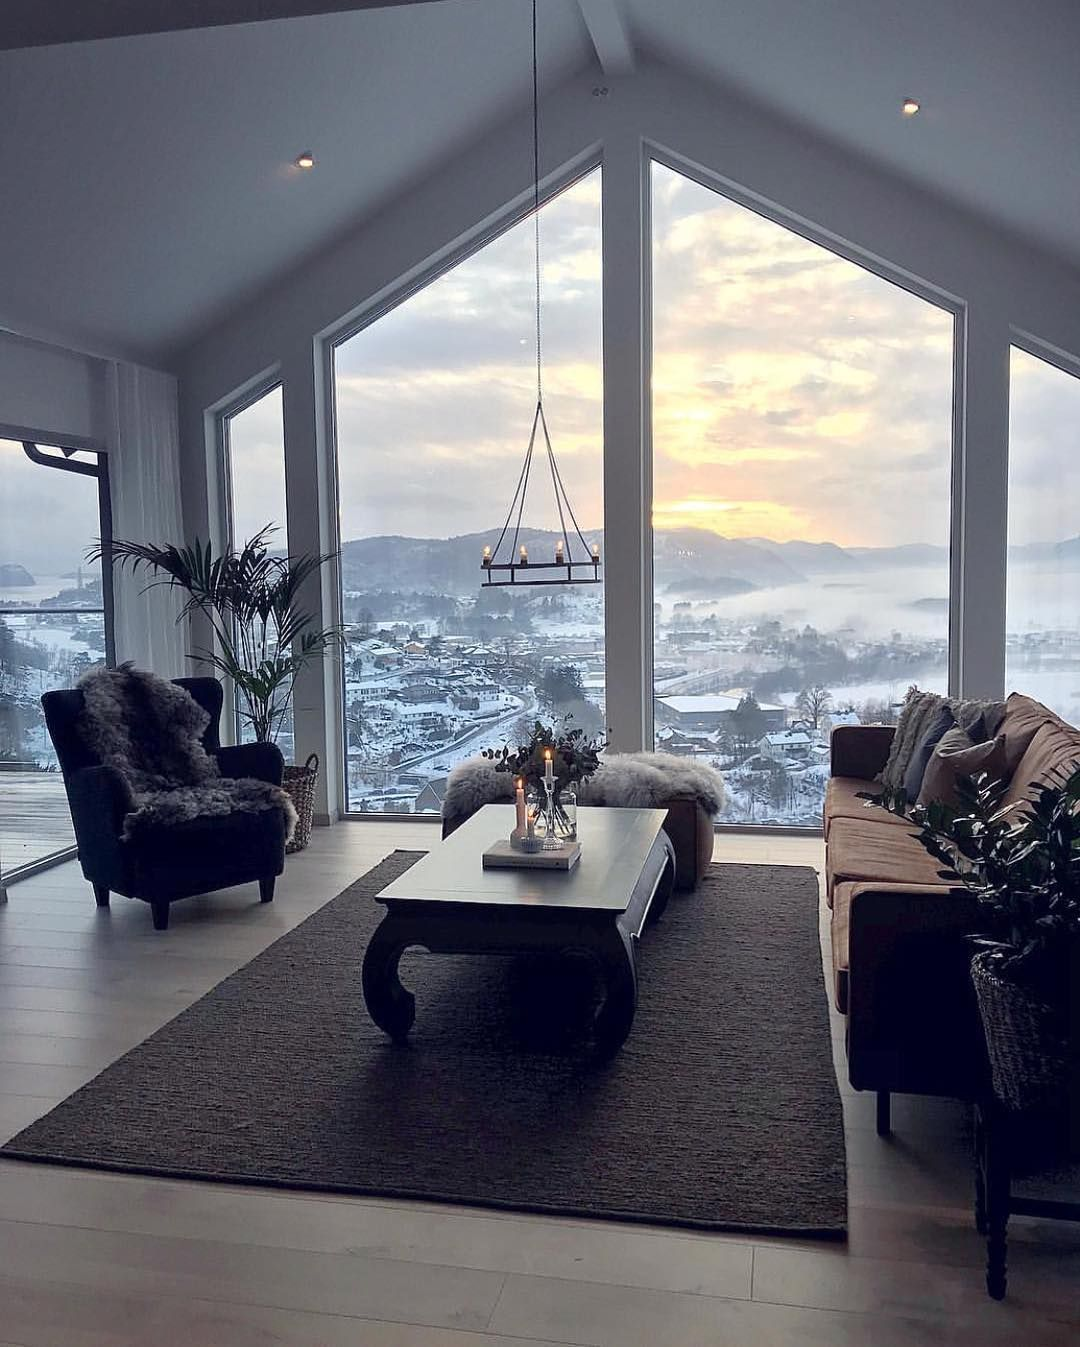 Best Furniture Store Naples Fl Winter Home Decor Winter Living